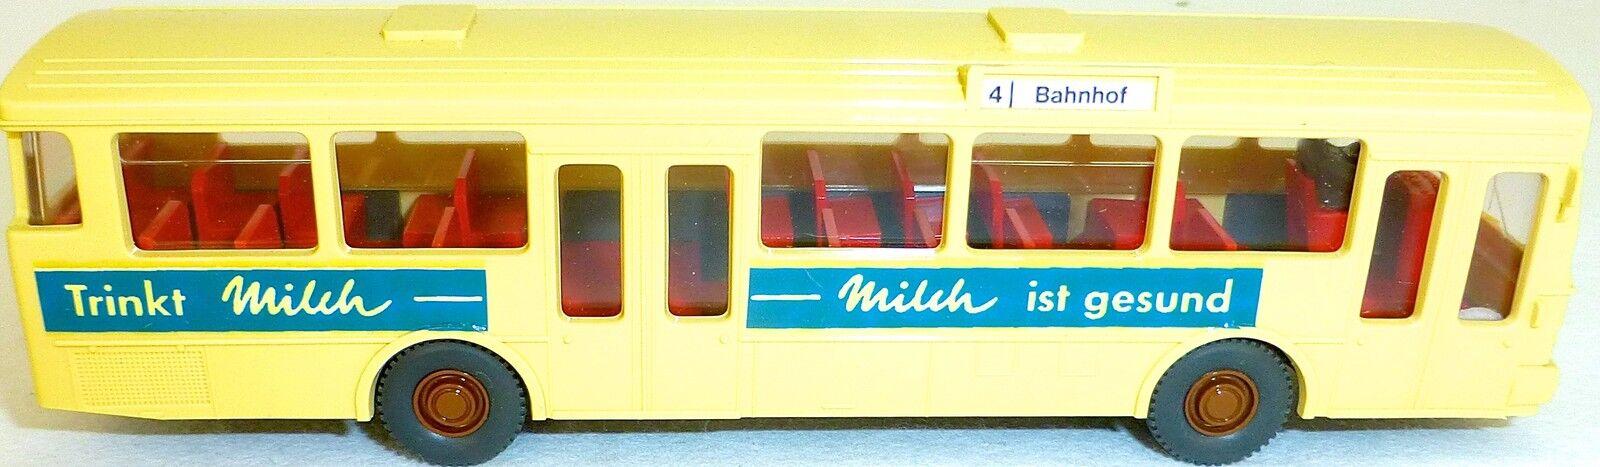 4 Gare Boit Lait Jedentag MB o305 Gesupert de Wiking Bus H0 1 87 GD4 Å